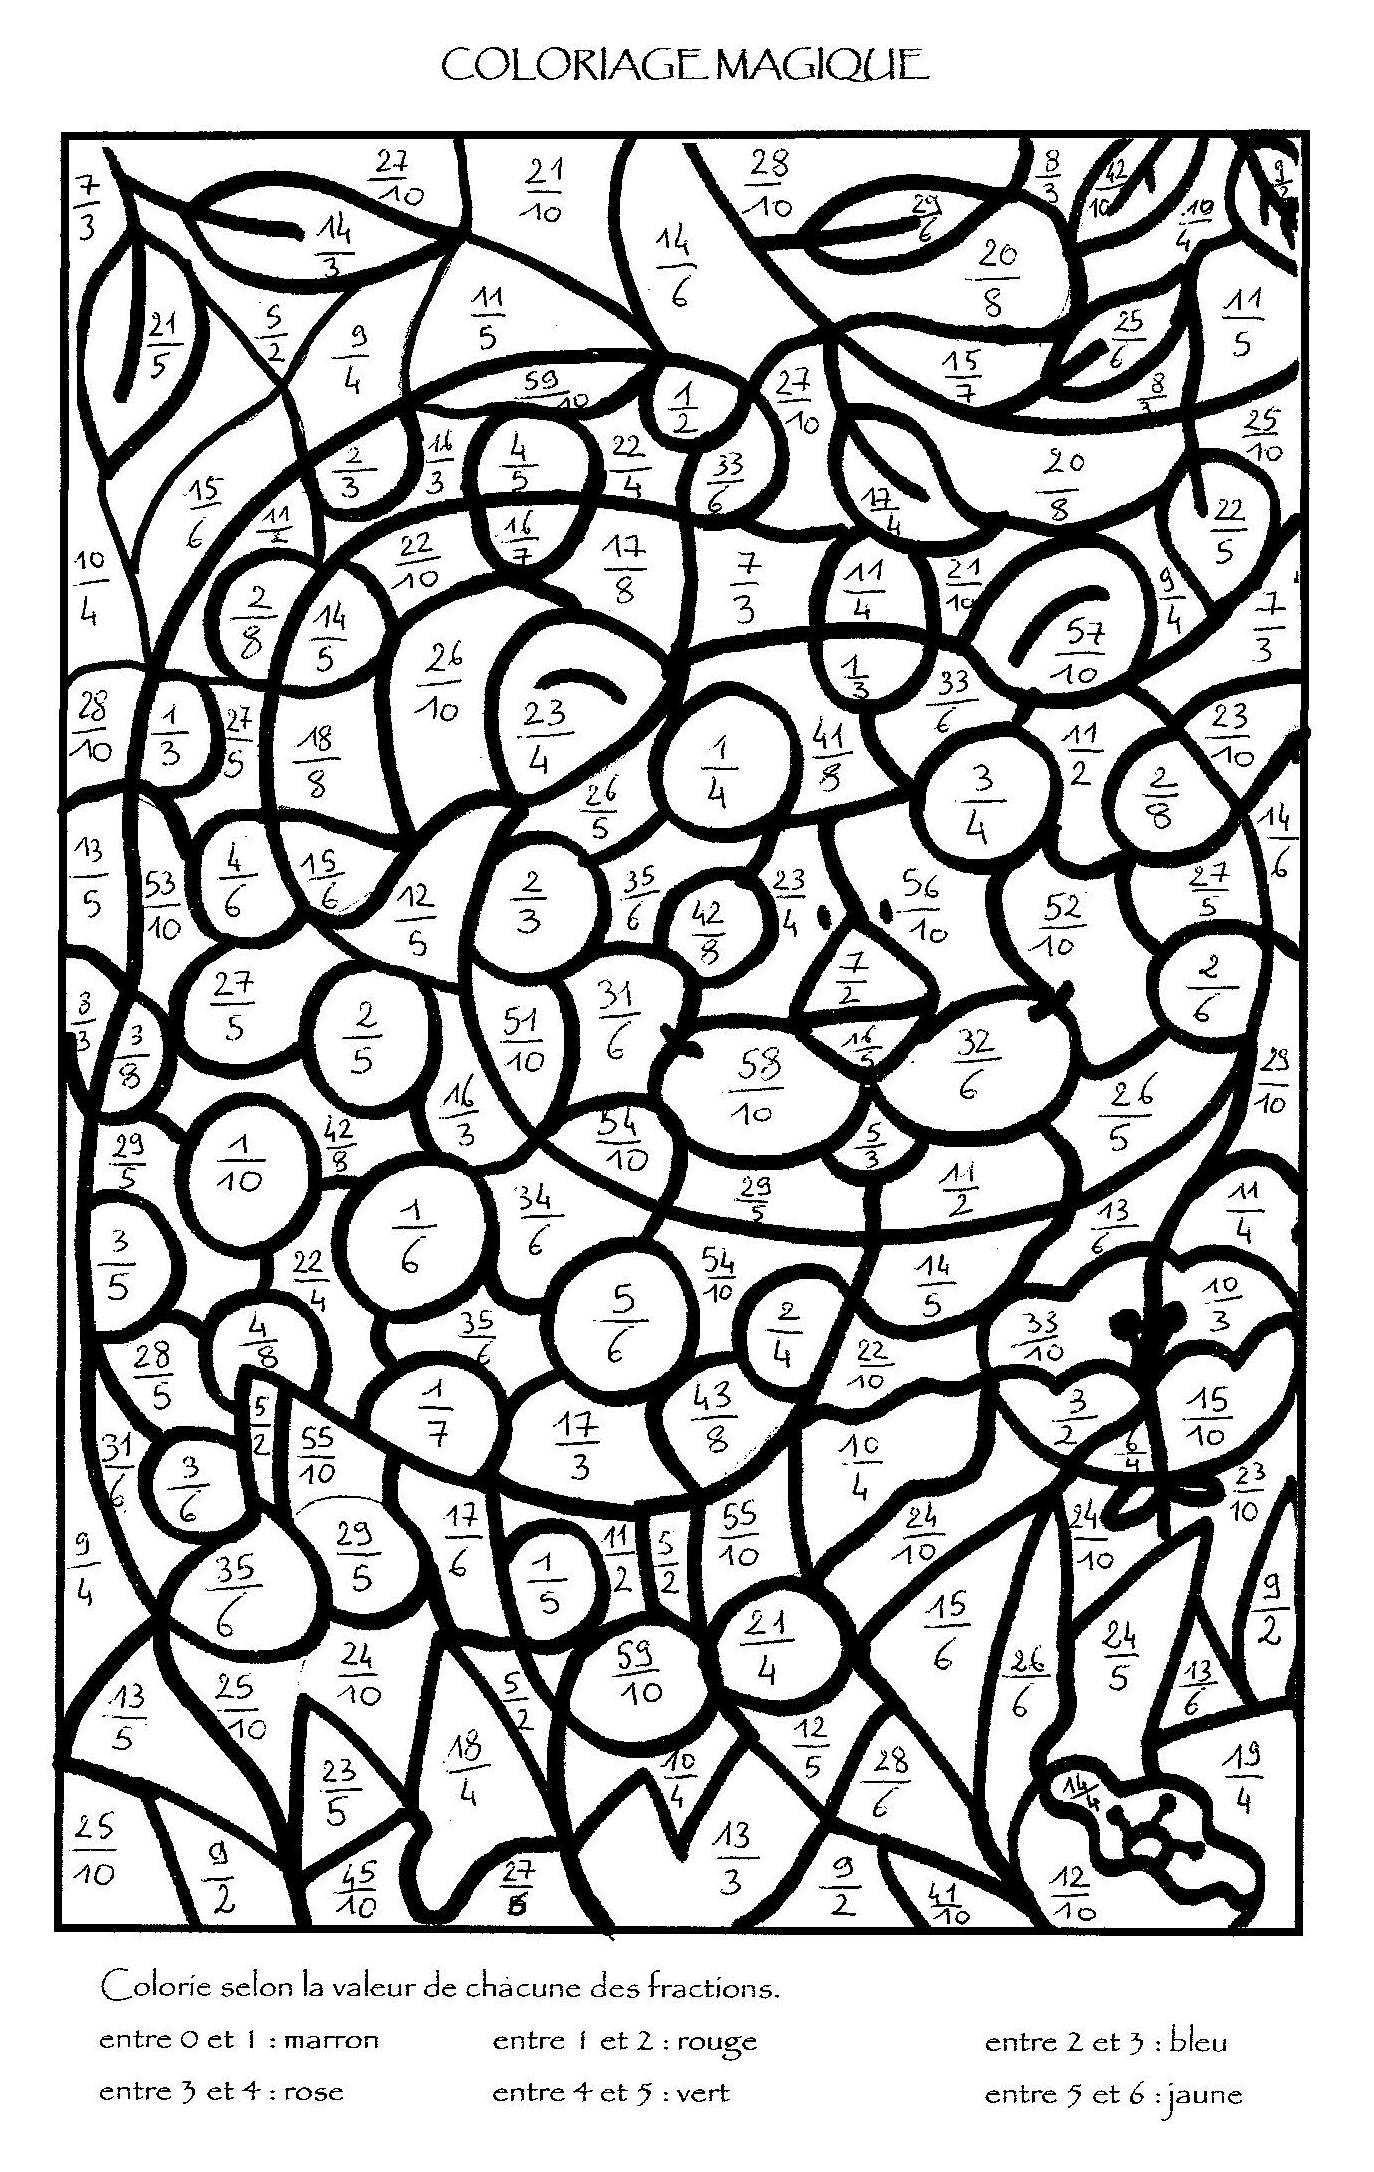 Coloriage Magique Unites Dizaines Centaines Ce2.Coloriage204 Coloriage Magique Fractions